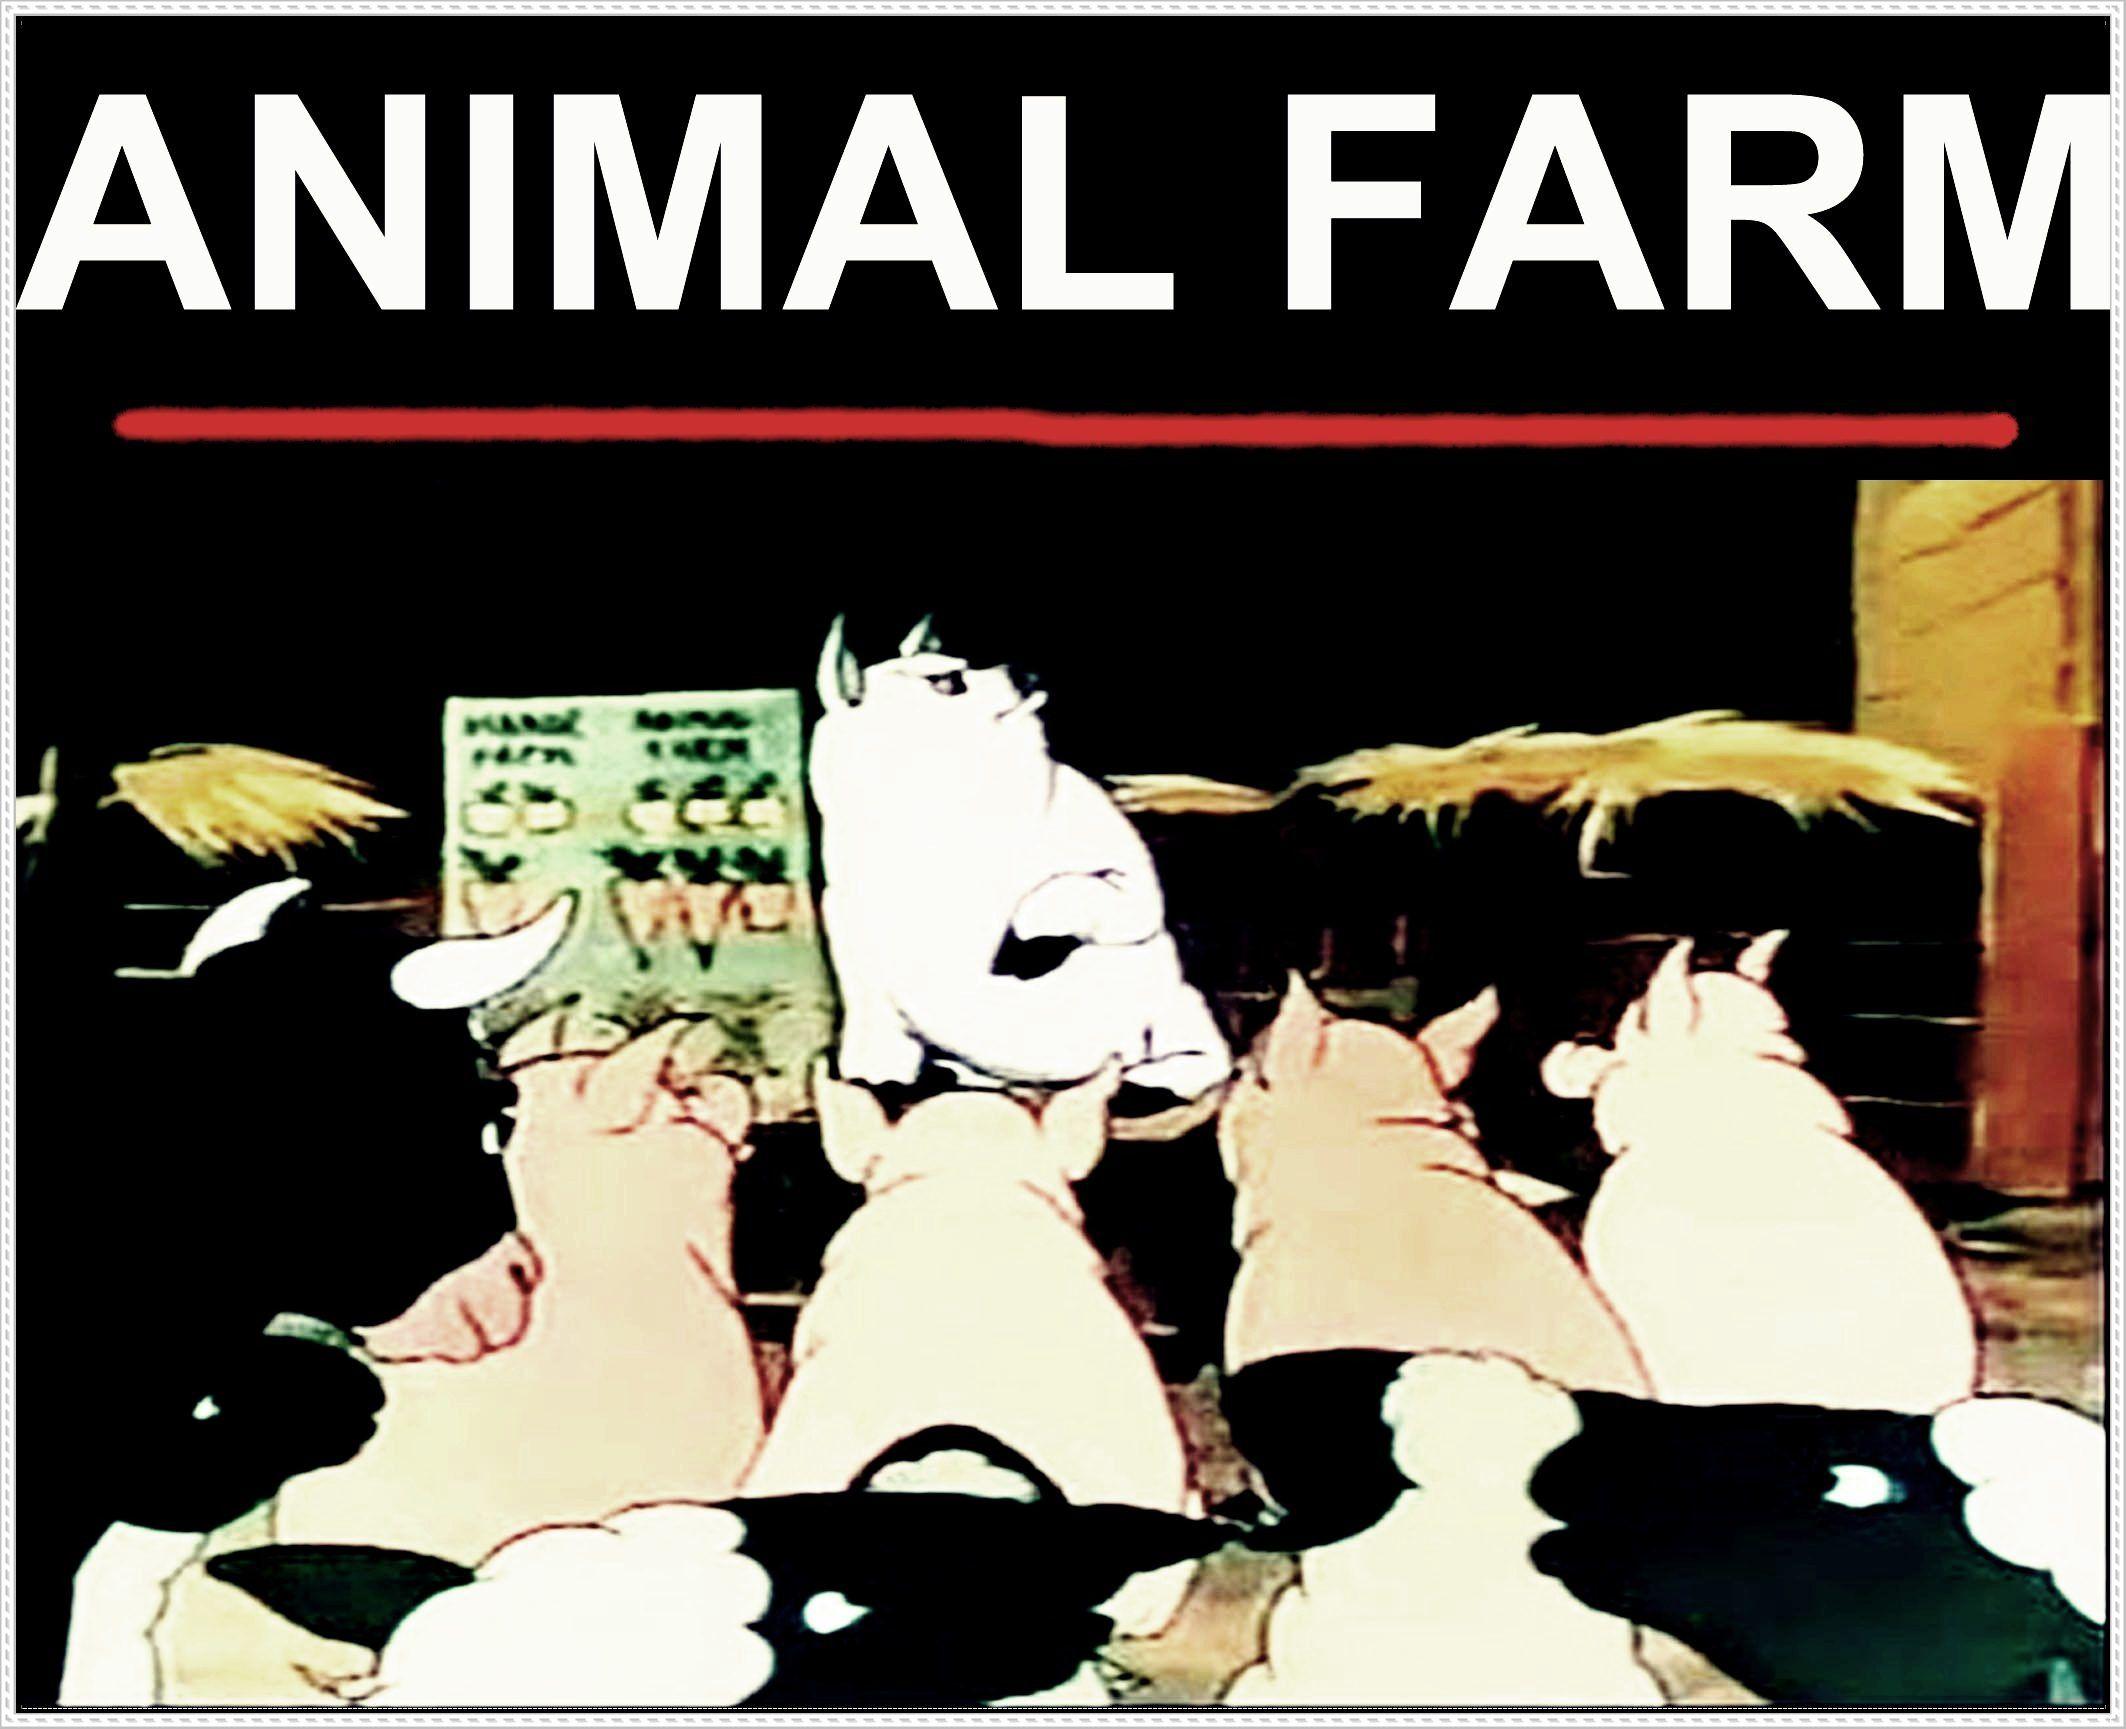 Book Review: Animal Farm by George Orwell | Youth Ki Awaaz